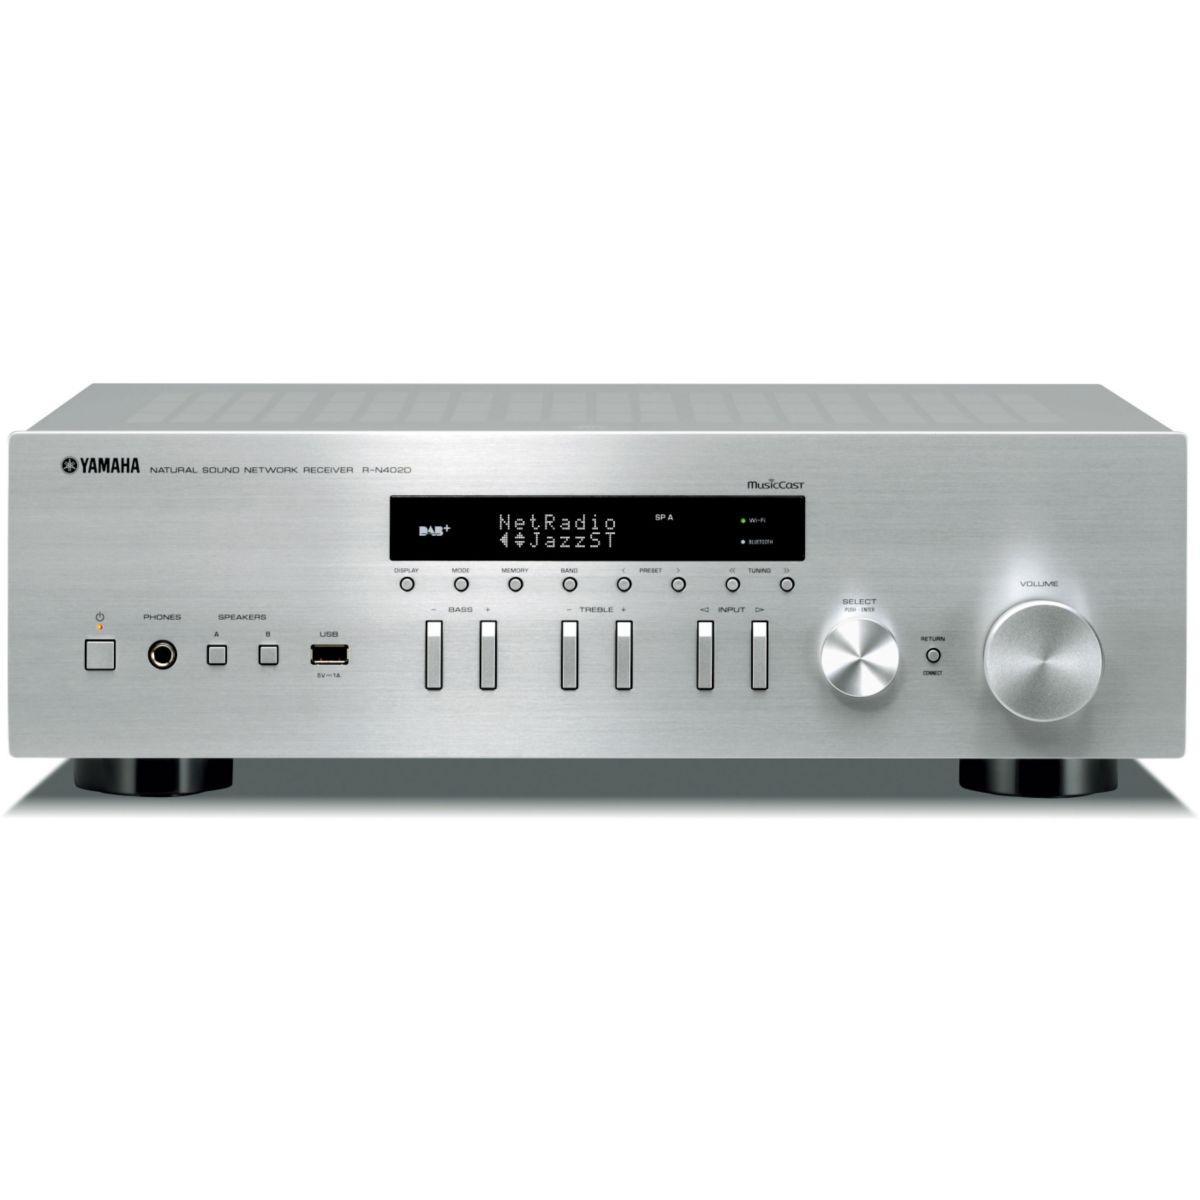 Amplificateur hifi yamaha musiccast rn402 silver - livraison offerte : code livprem (photo)